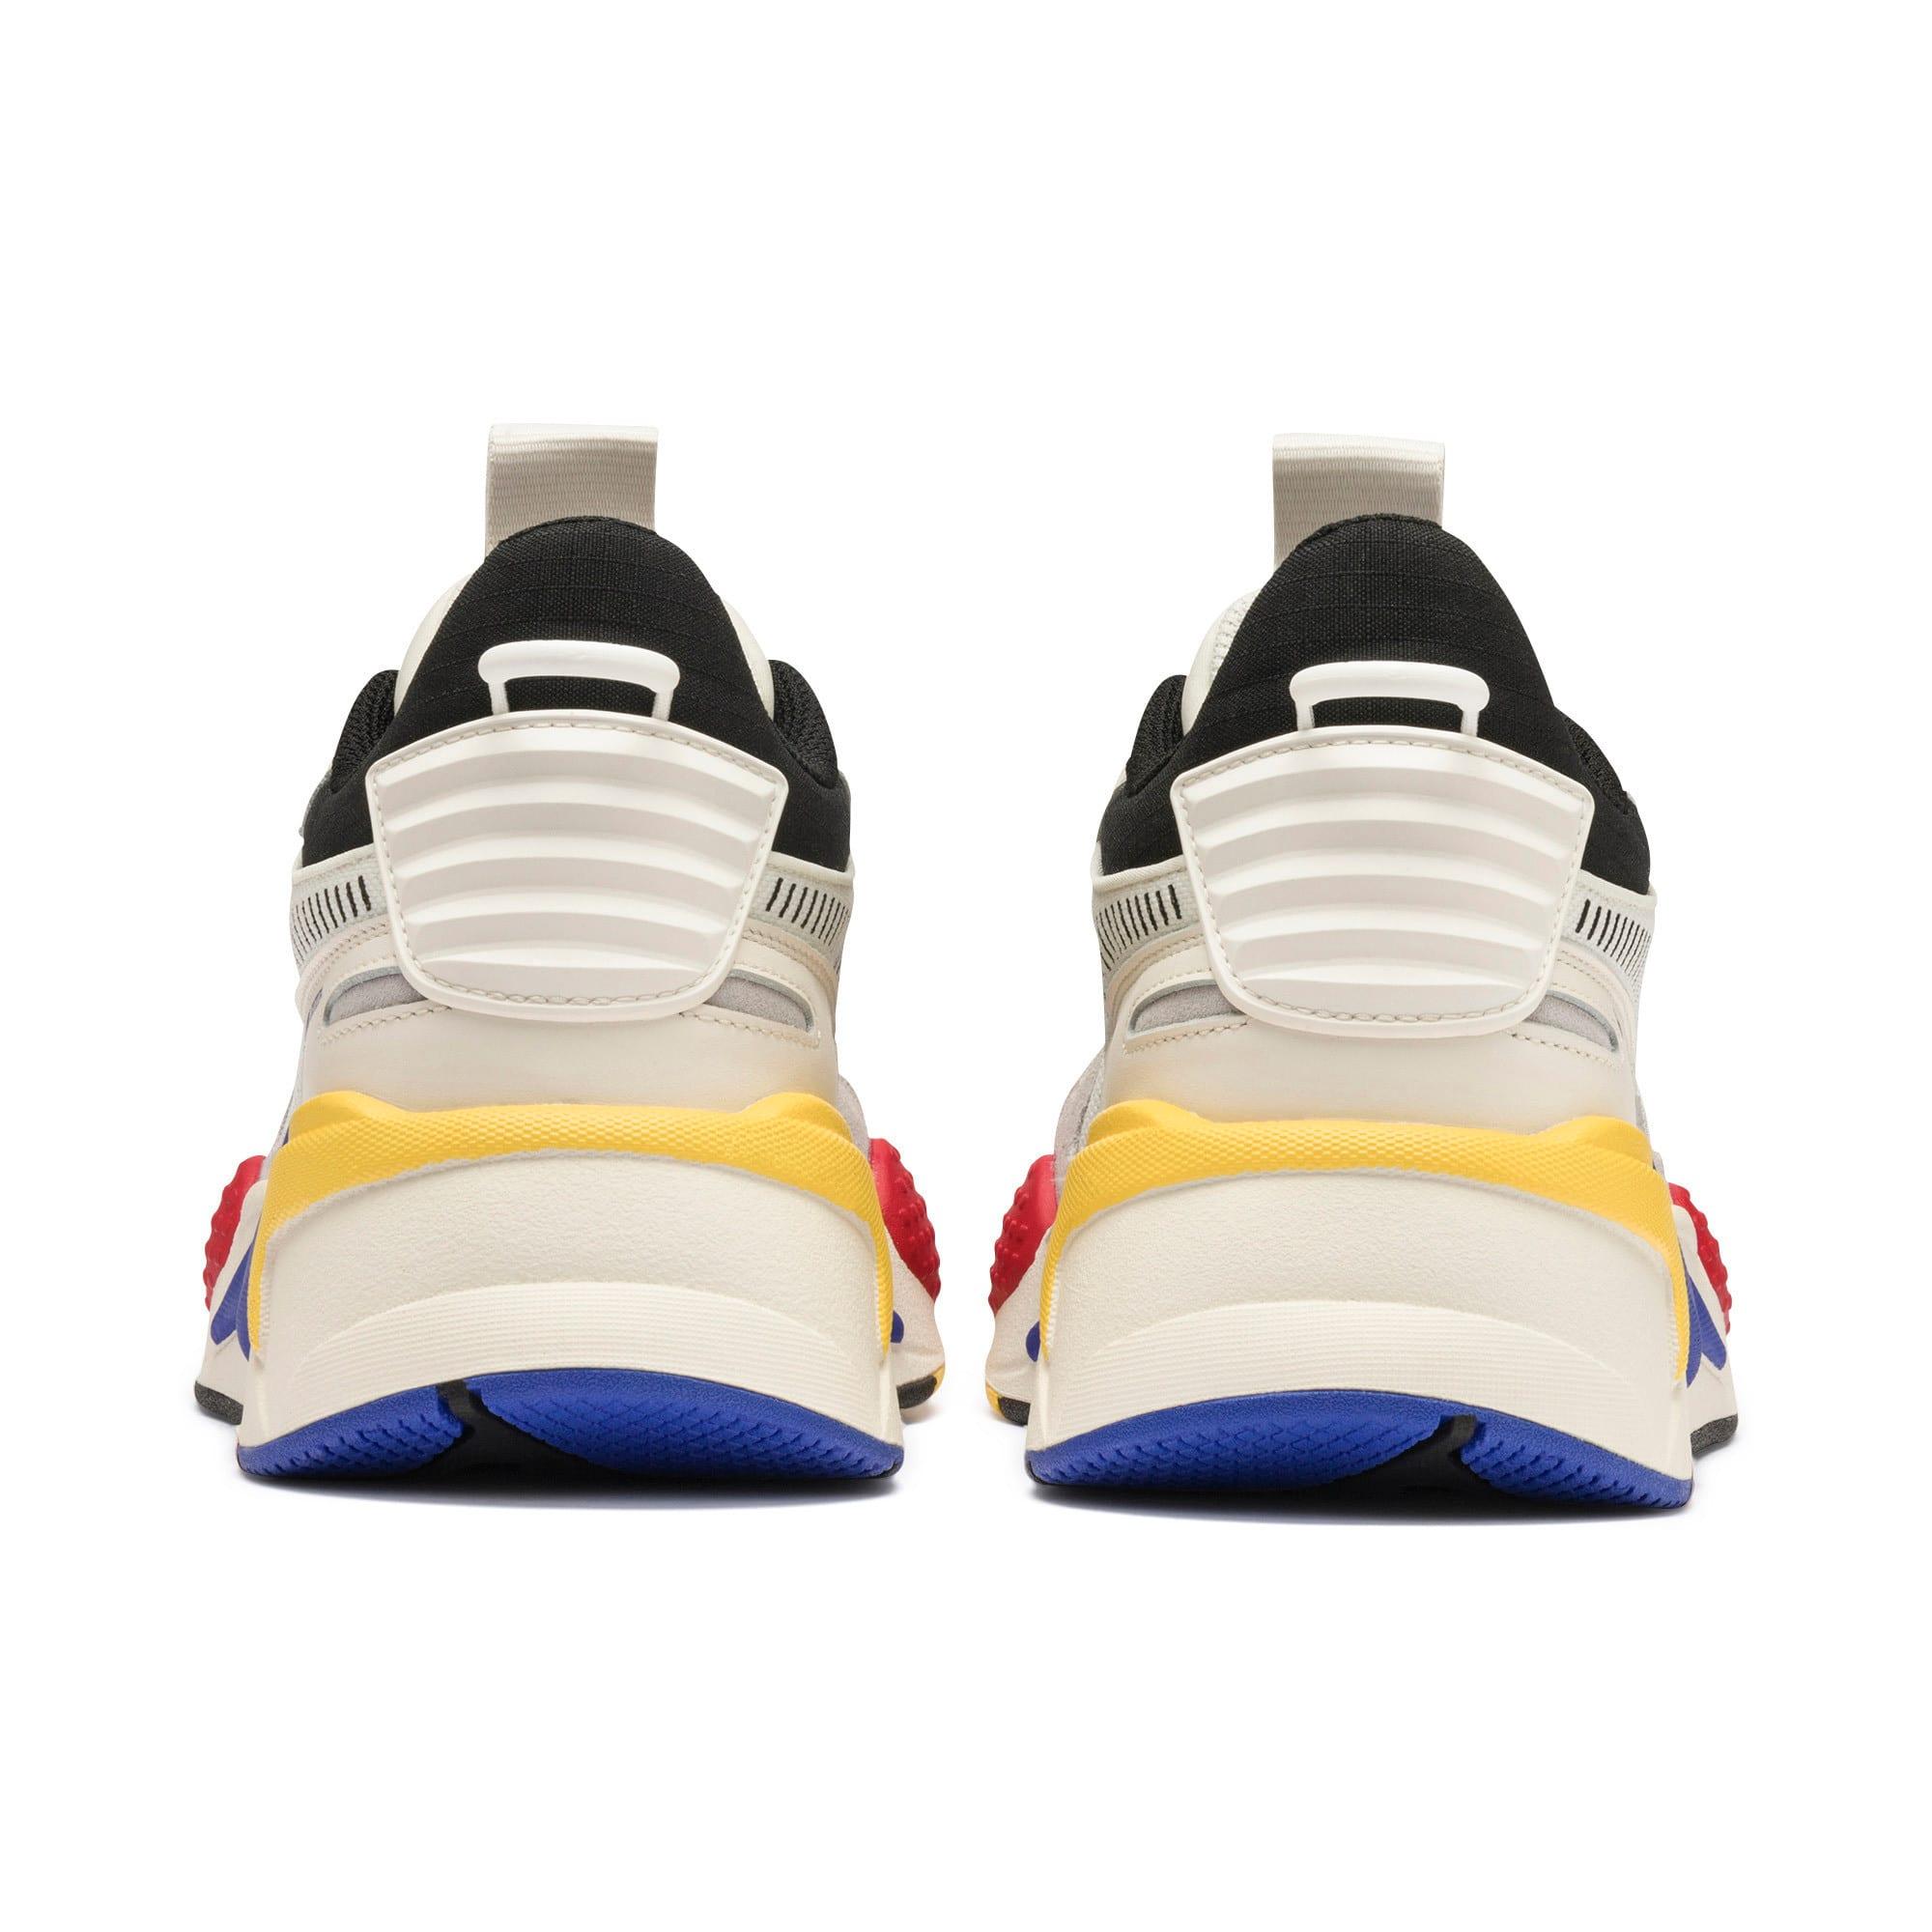 Thumbnail 4 of RS-X Colour Theory Sneaker, Whisper White-Puma Black, medium